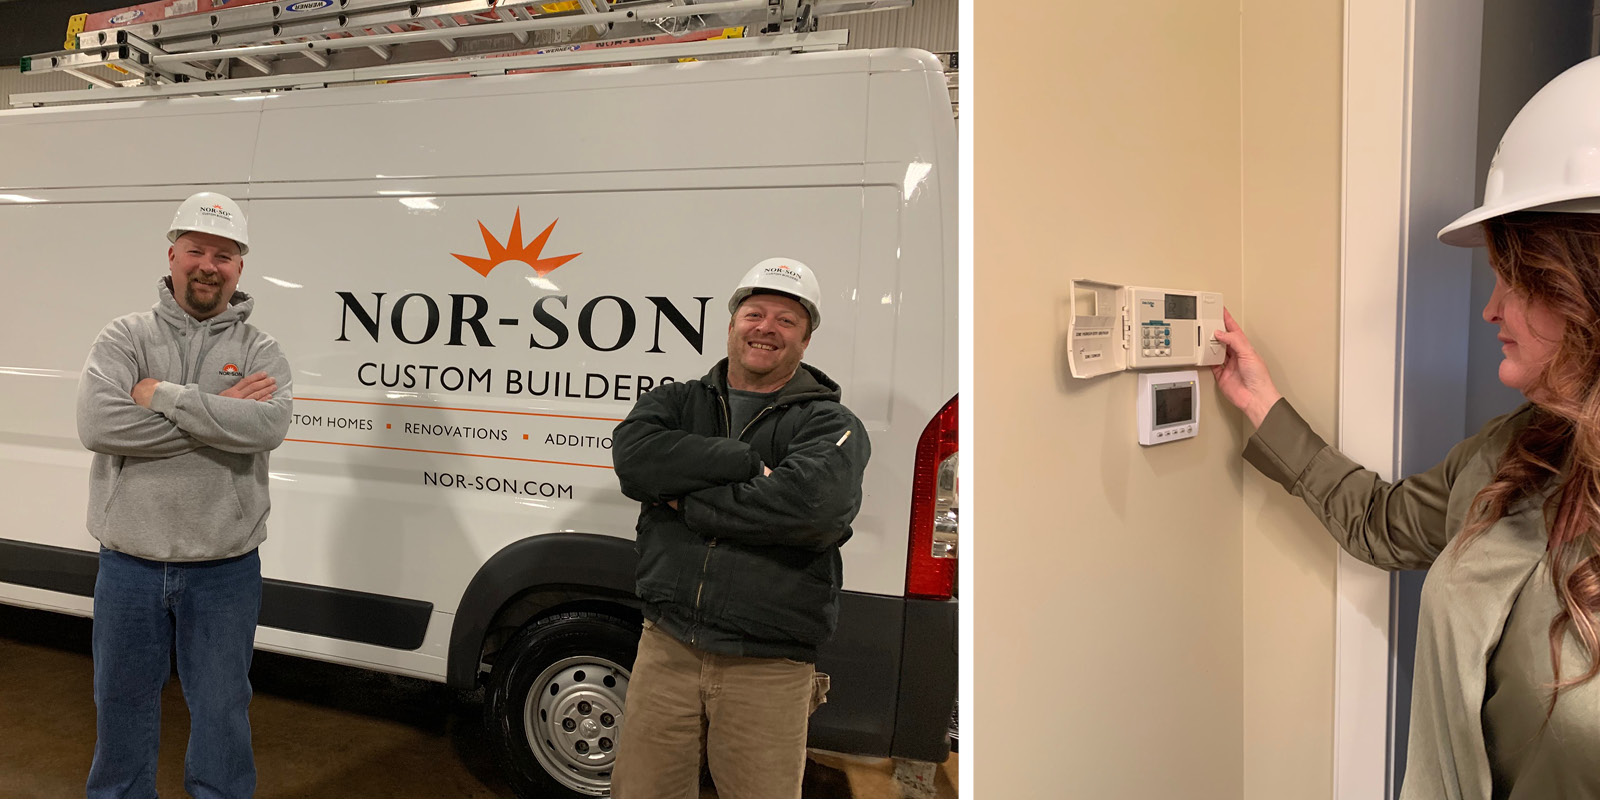 Nor-son custom builder professionals